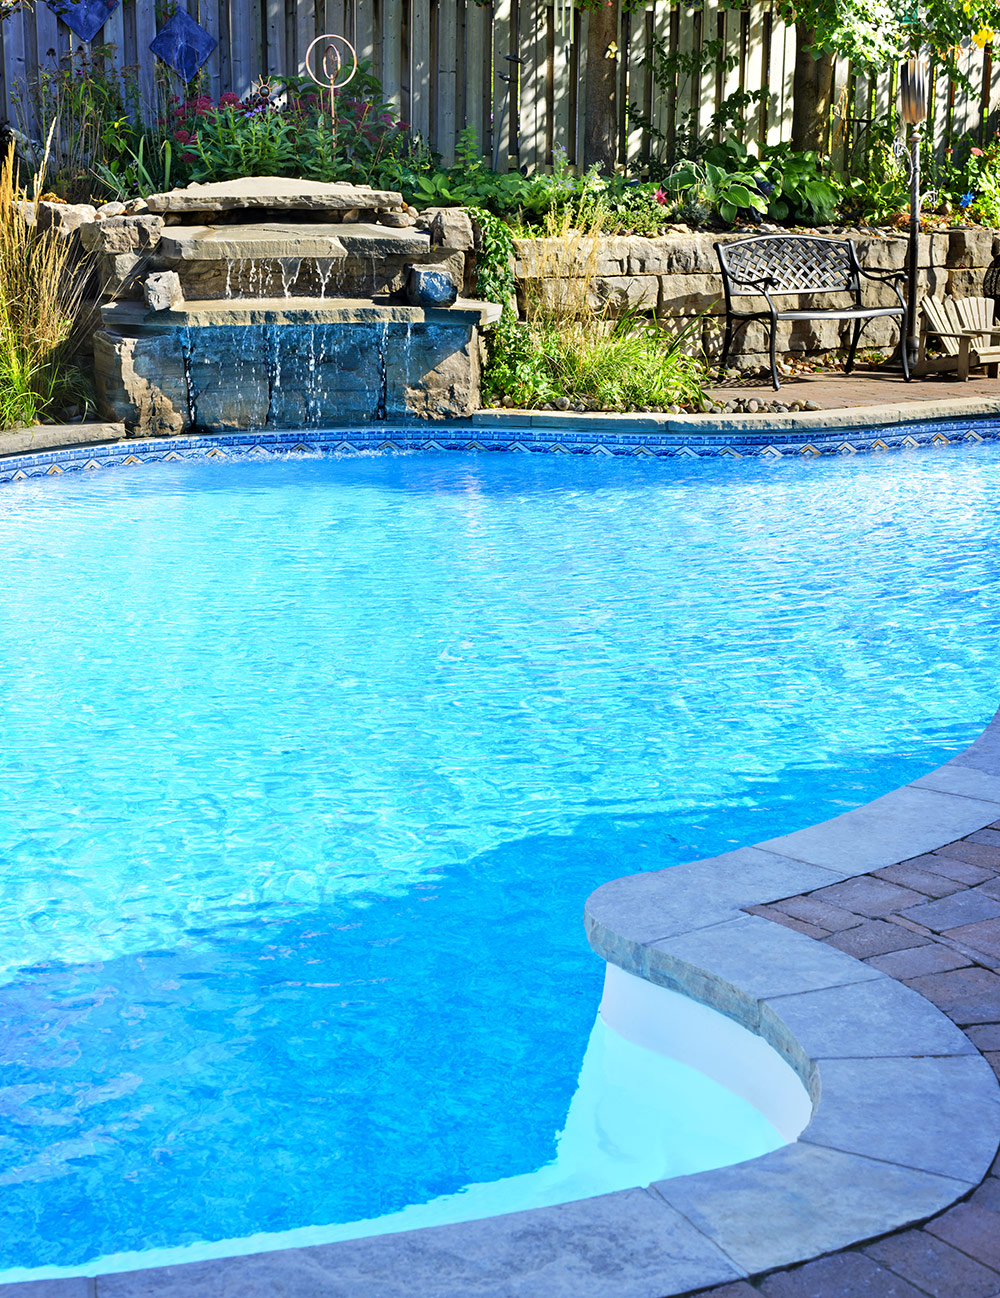 Where Pools Reign Supreme